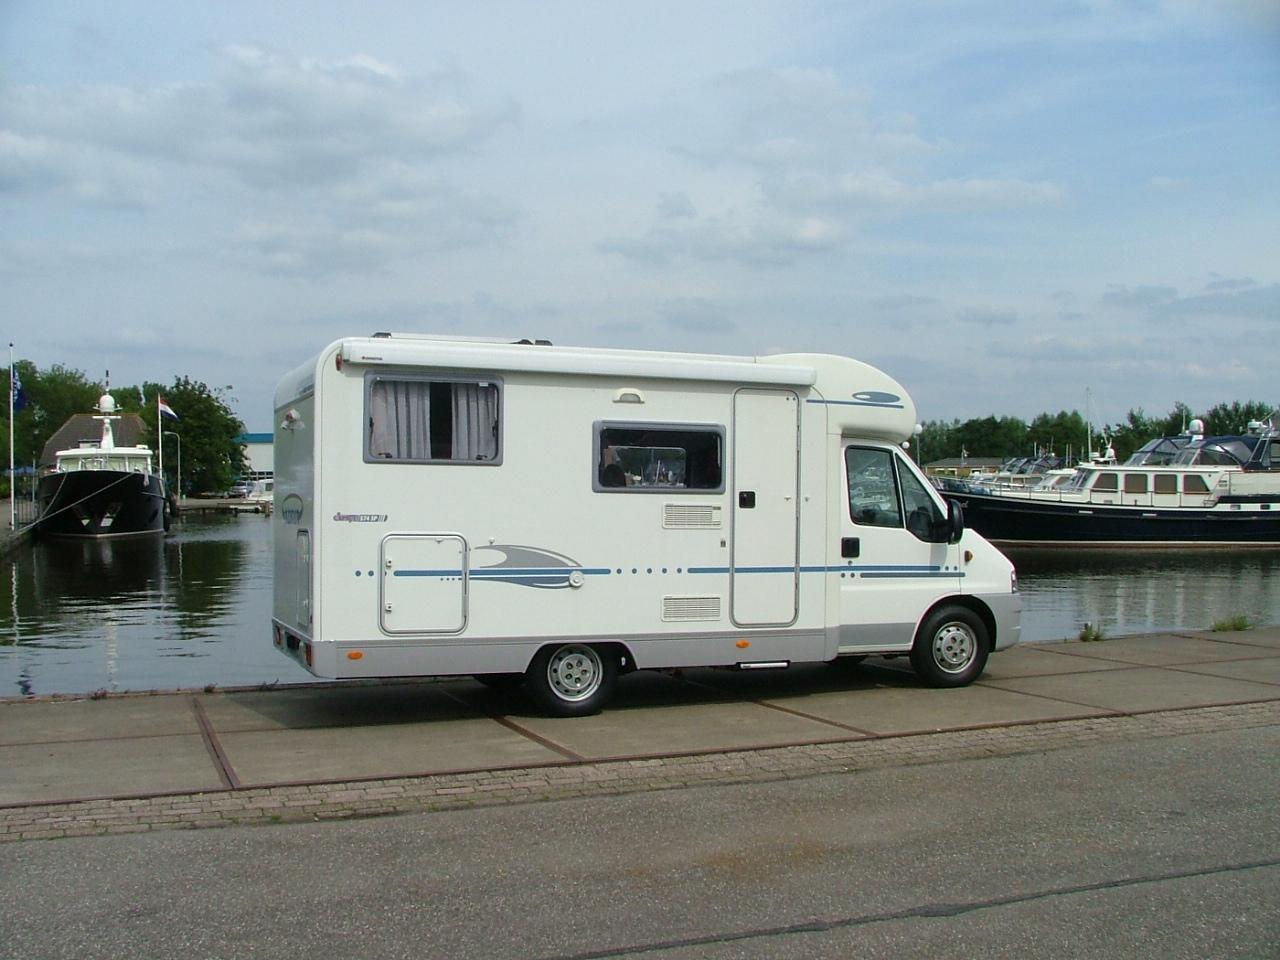 camper verhuur en verkoop van camper occasions kruisinga html autos weblog. Black Bedroom Furniture Sets. Home Design Ideas